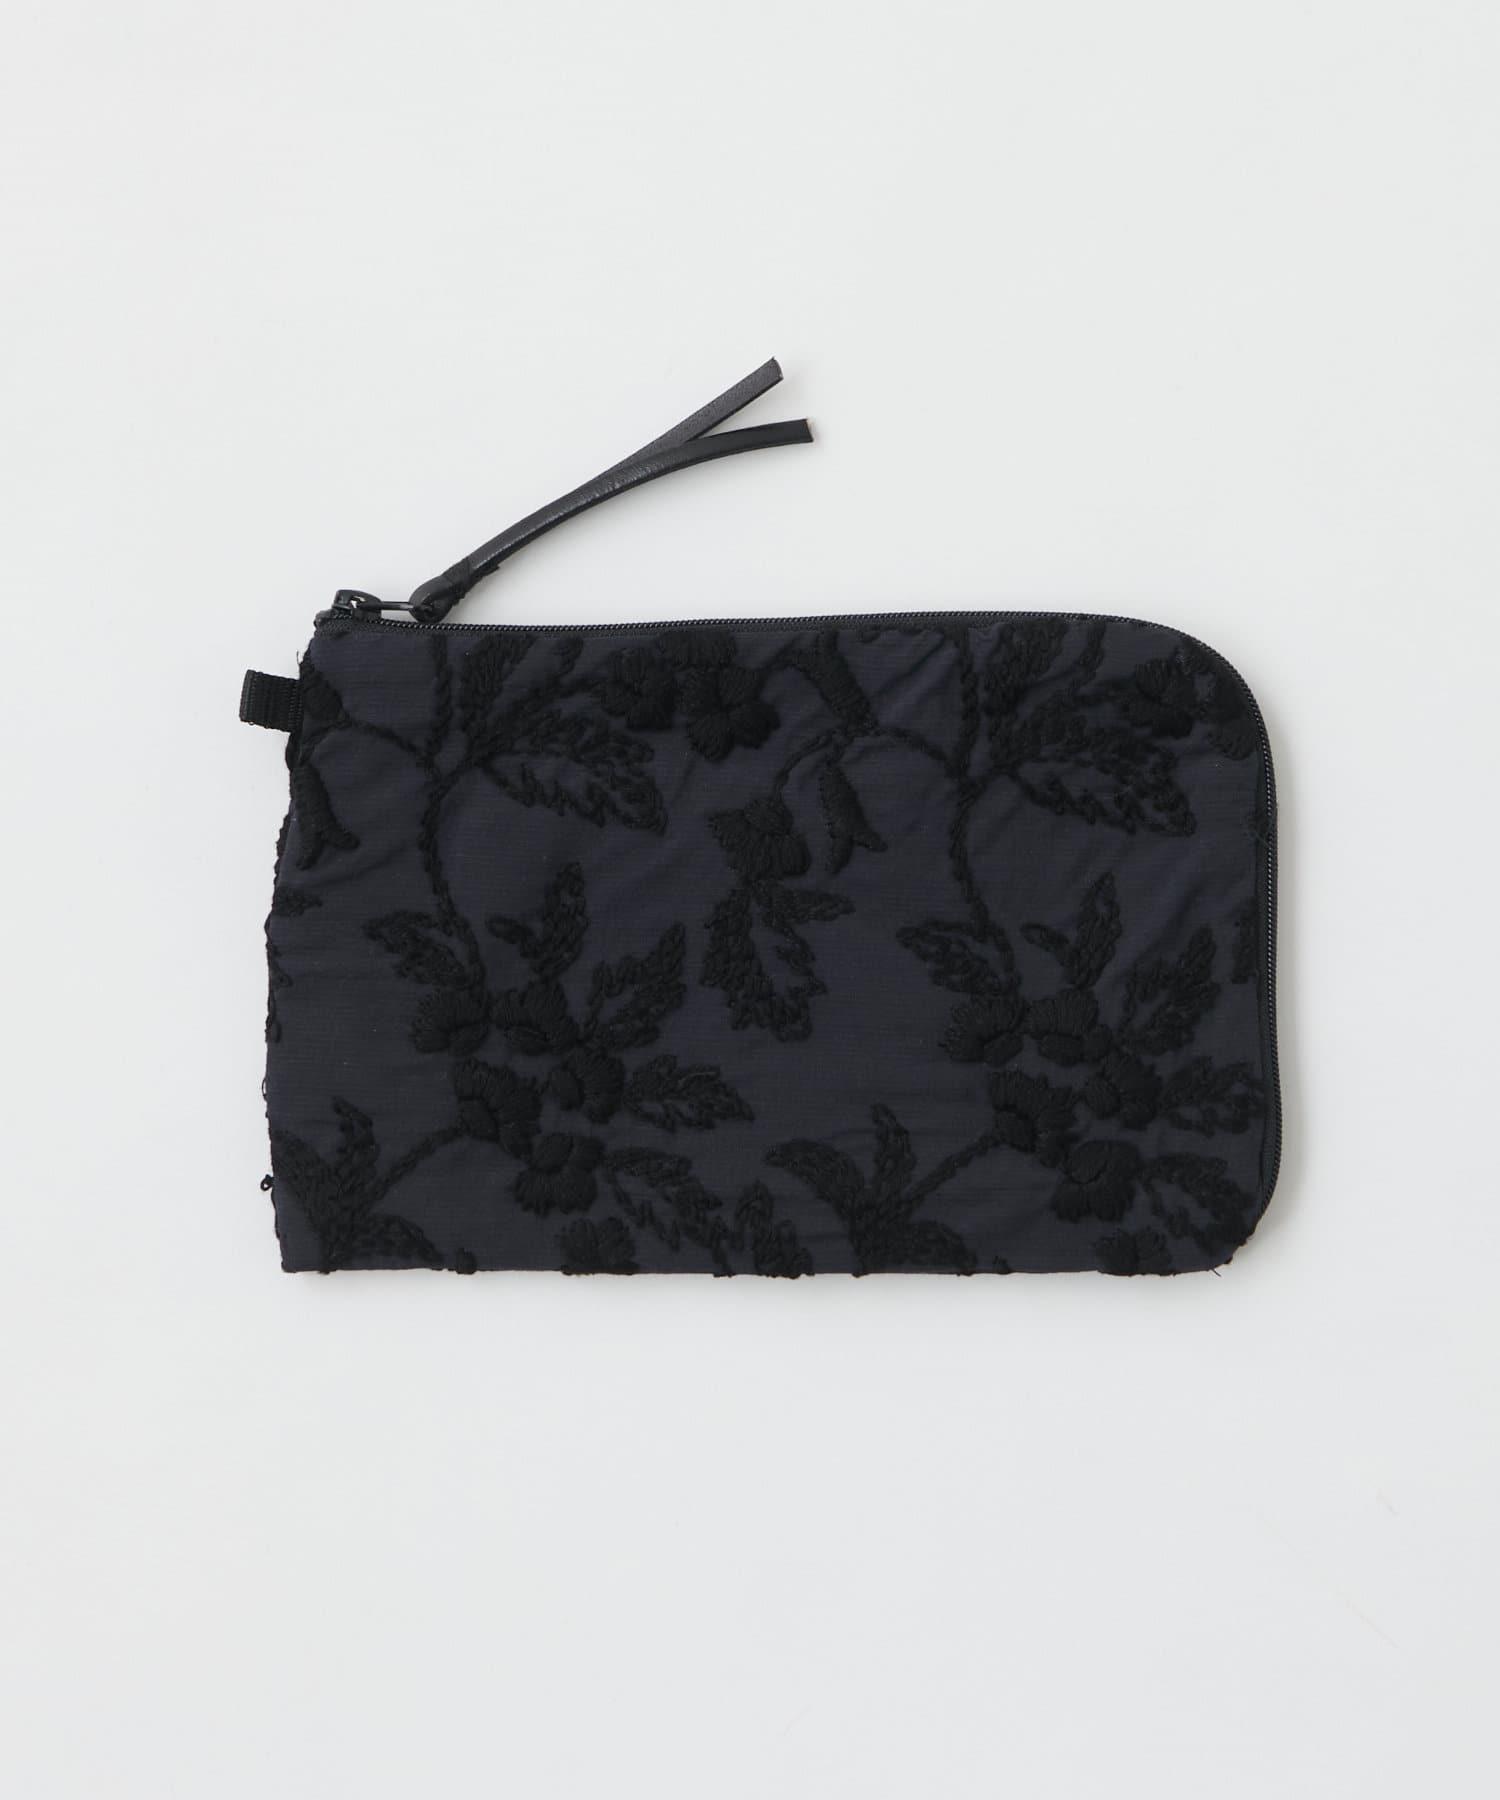 BEARDSLEY(ビアズリー) ライフスタイル 《BA×embroidery》刺繍手帳ポーチ ブラック